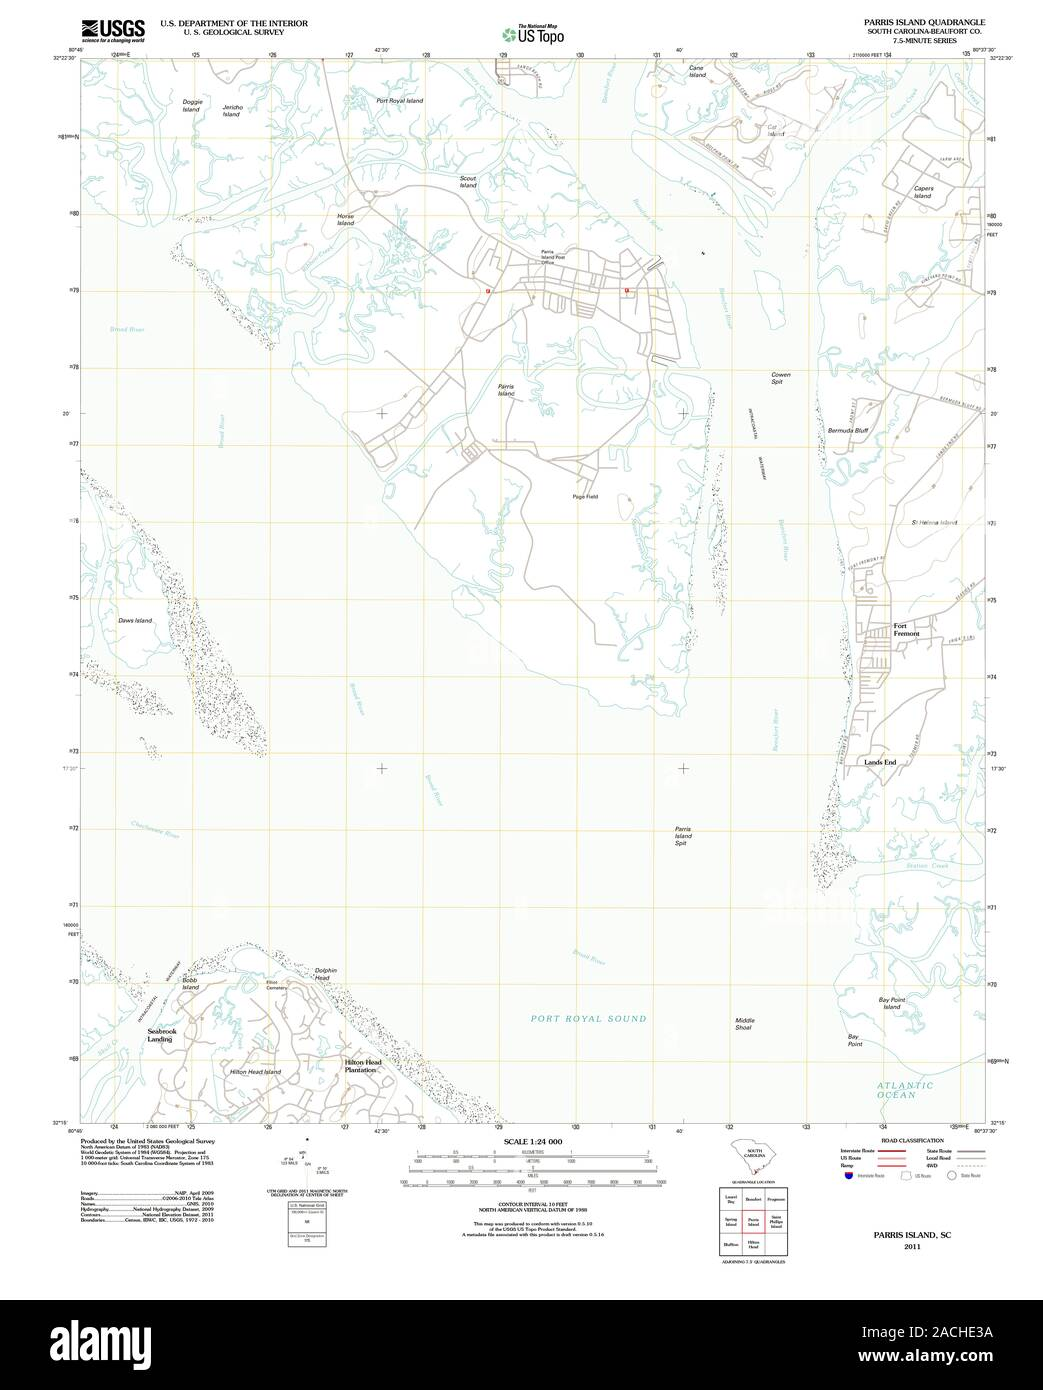 The Parris Island South Carolina Satellite Poster Map